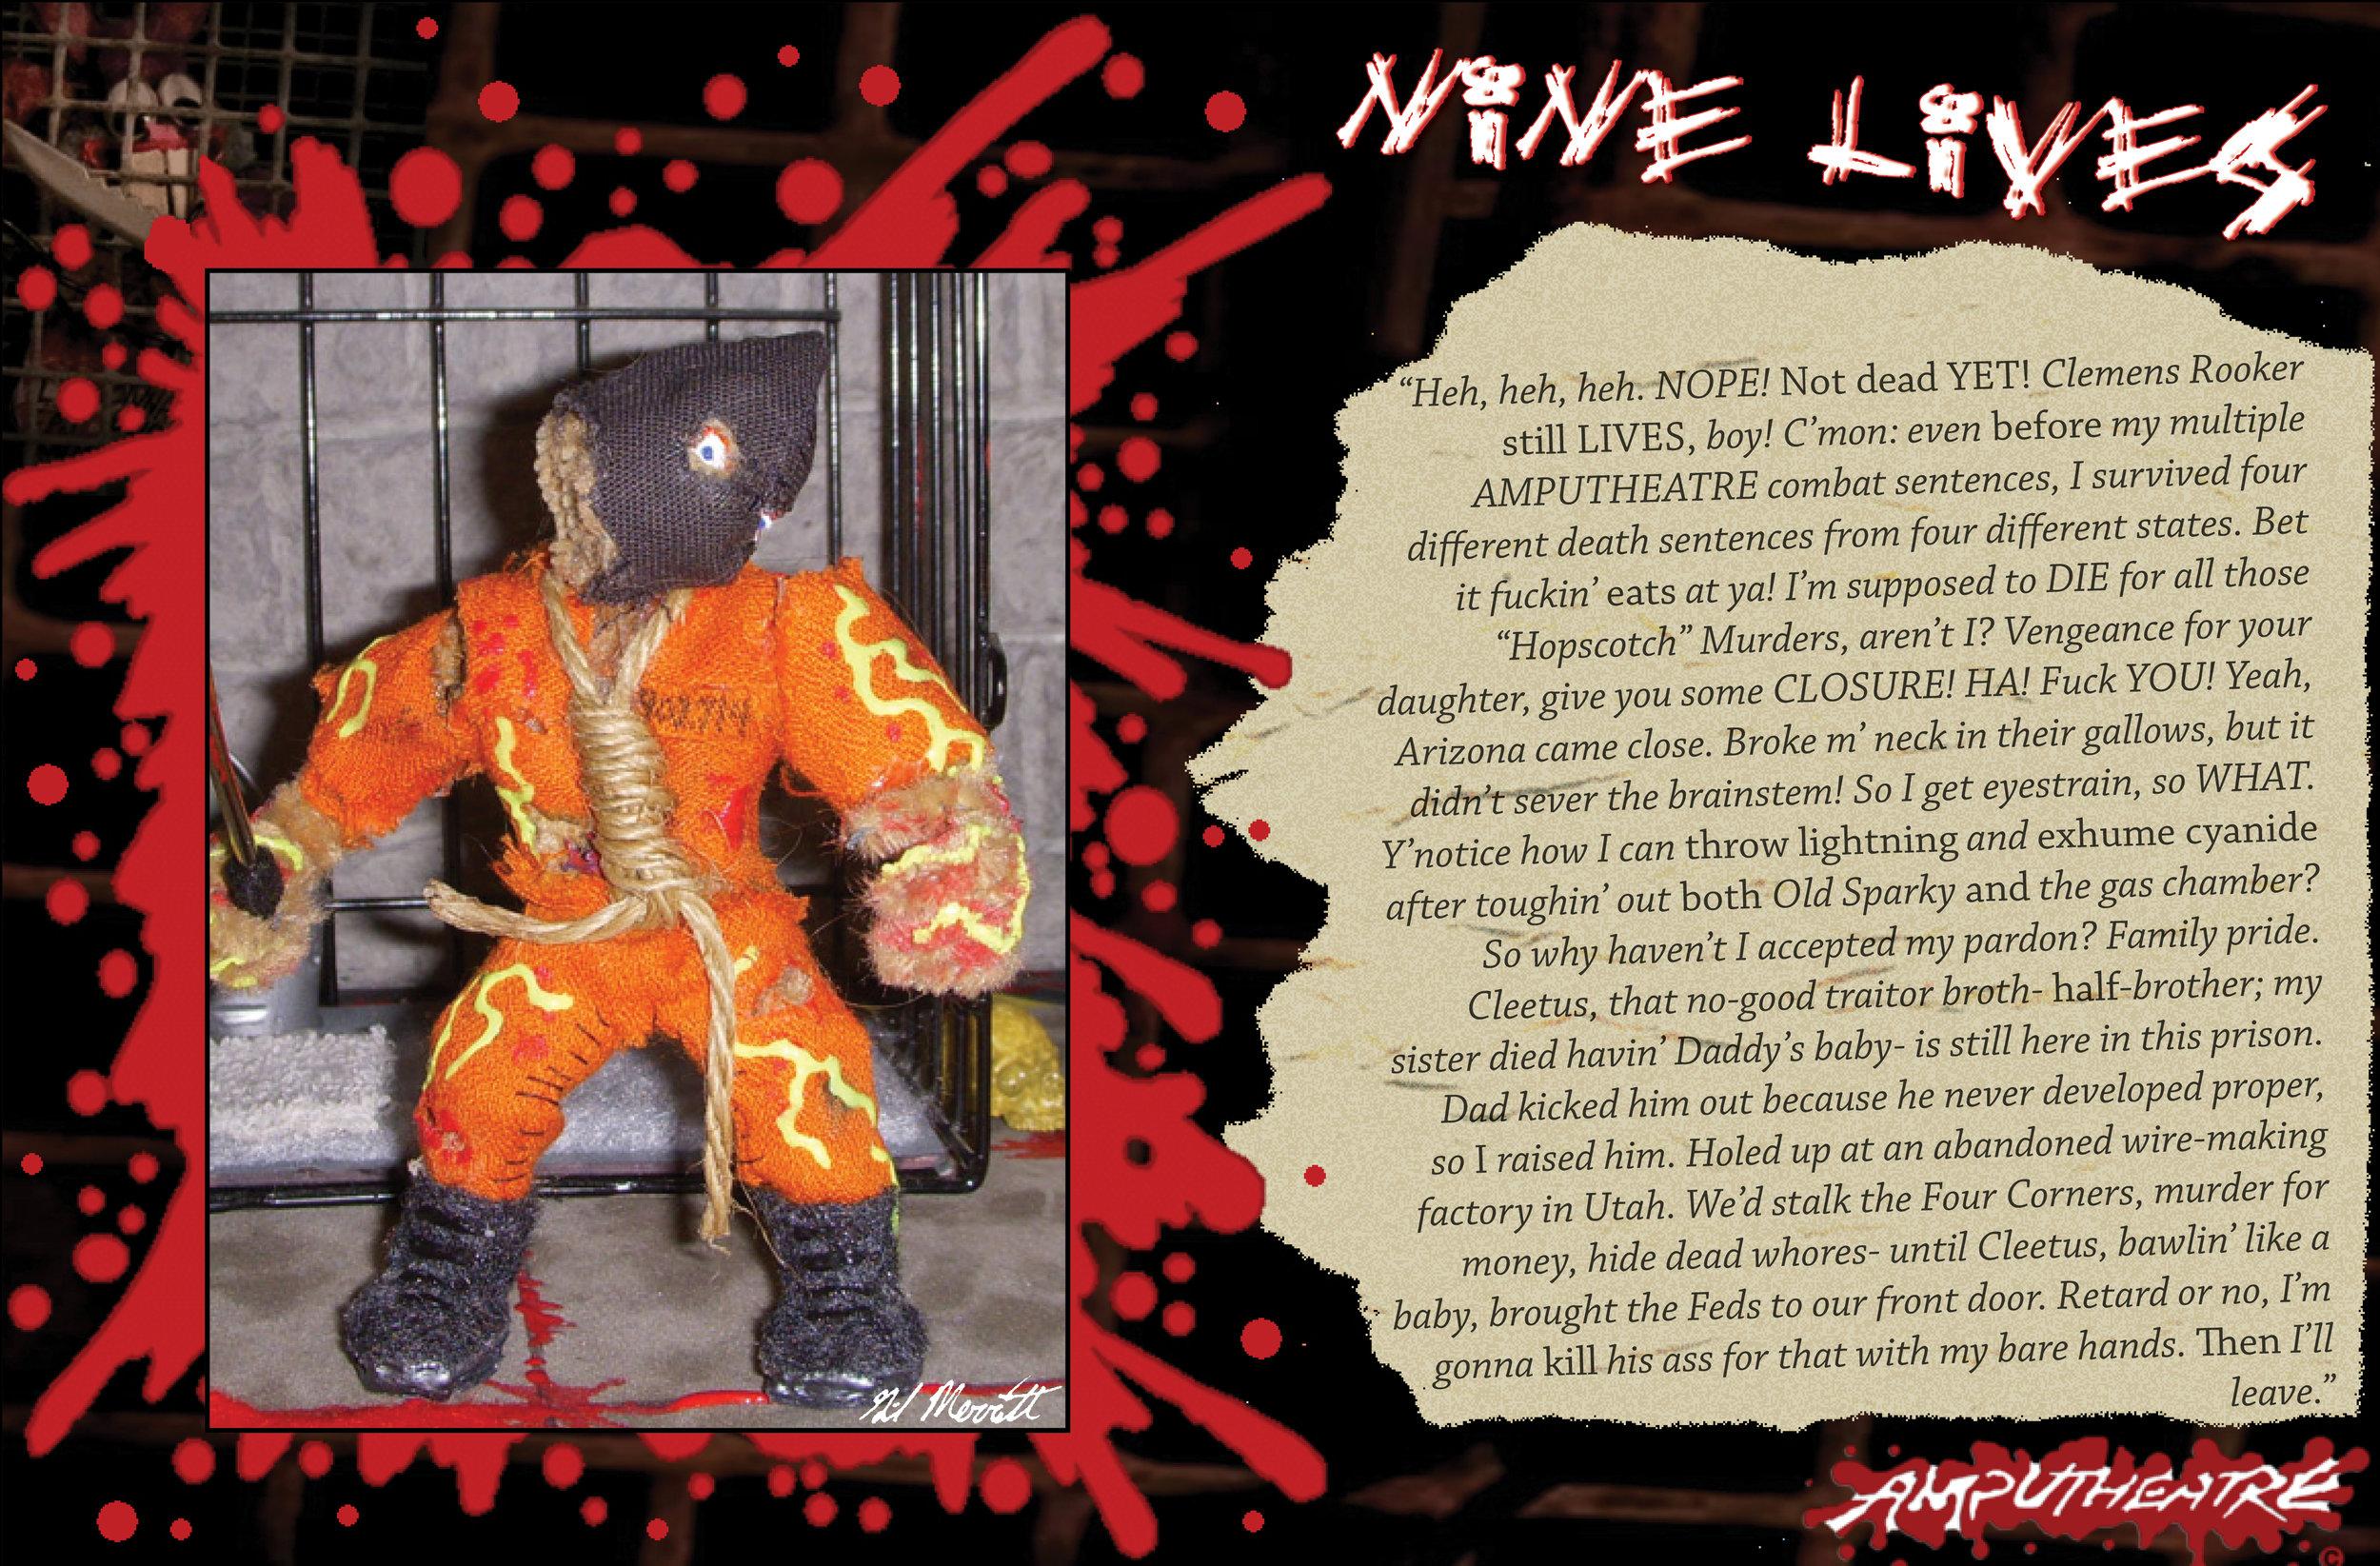 Profile Nine Lives.jpg